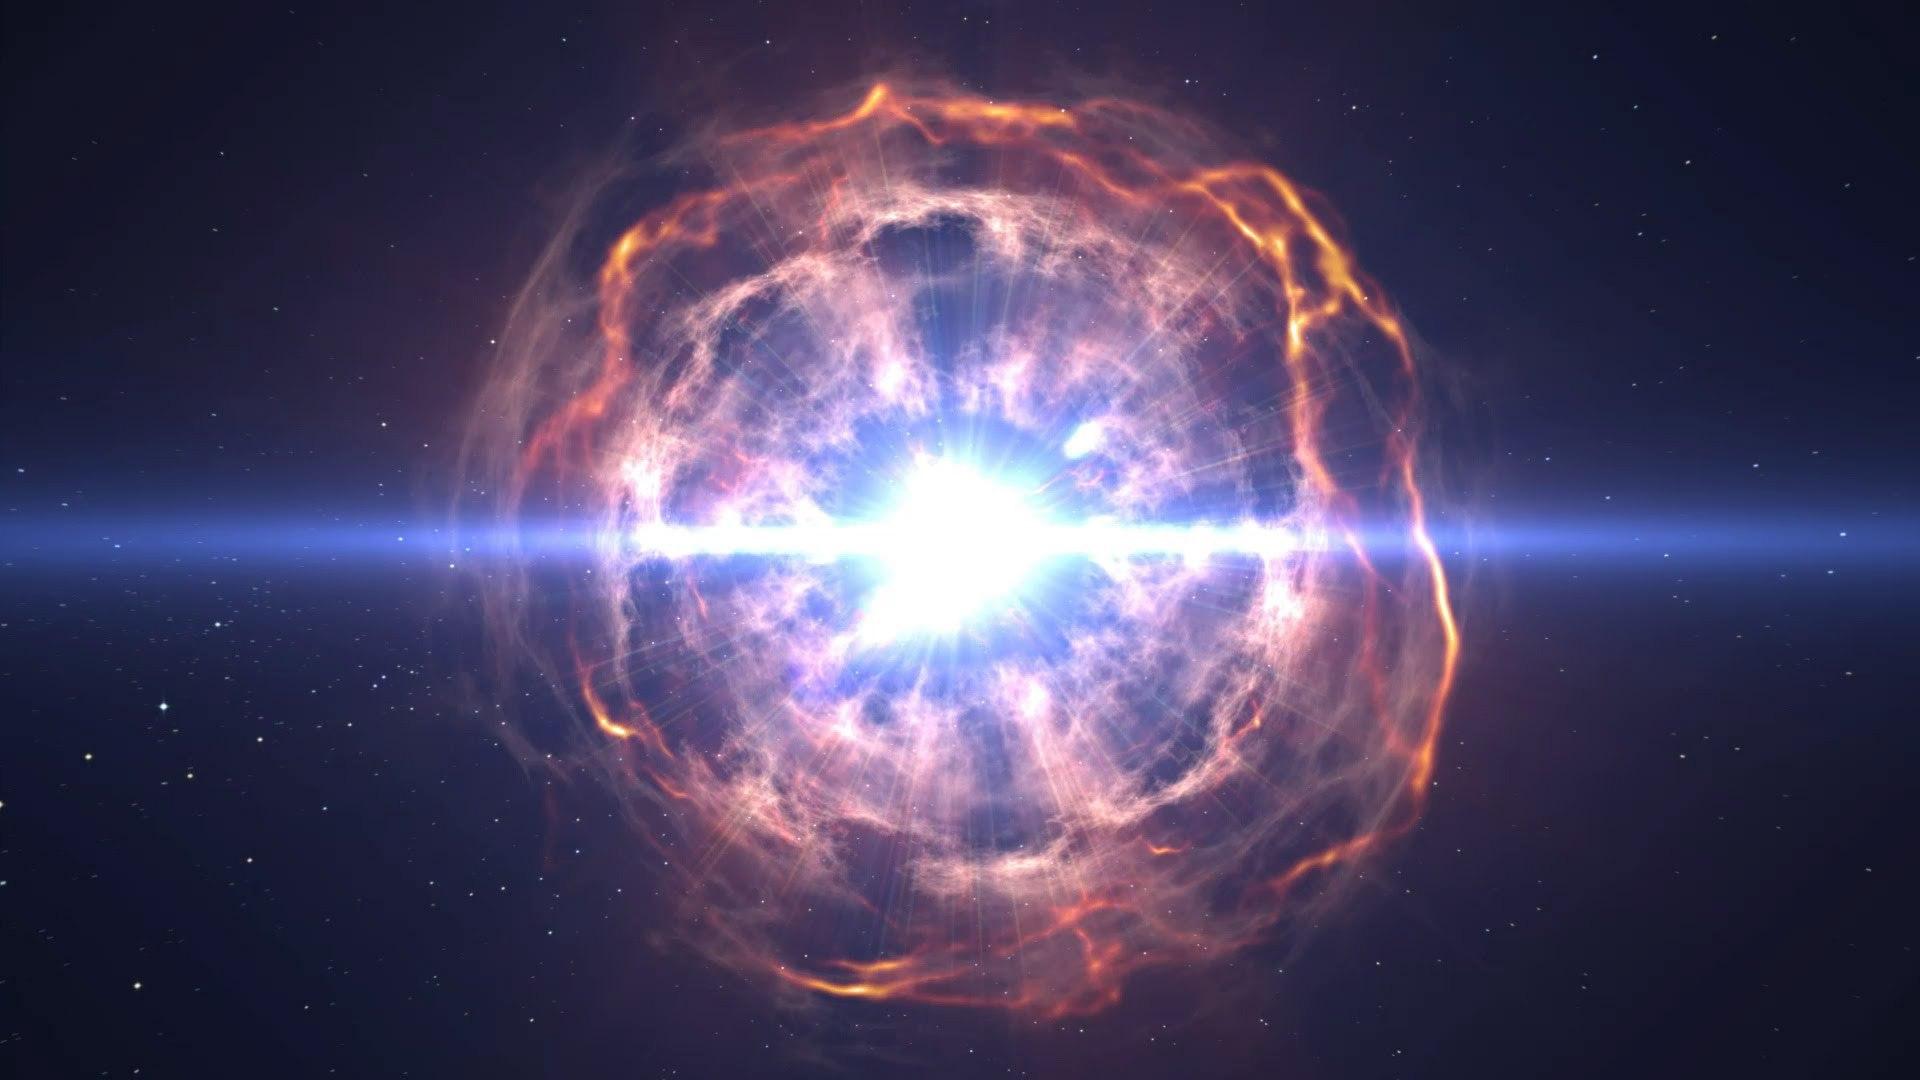 supernova element formation - HD1920×1080